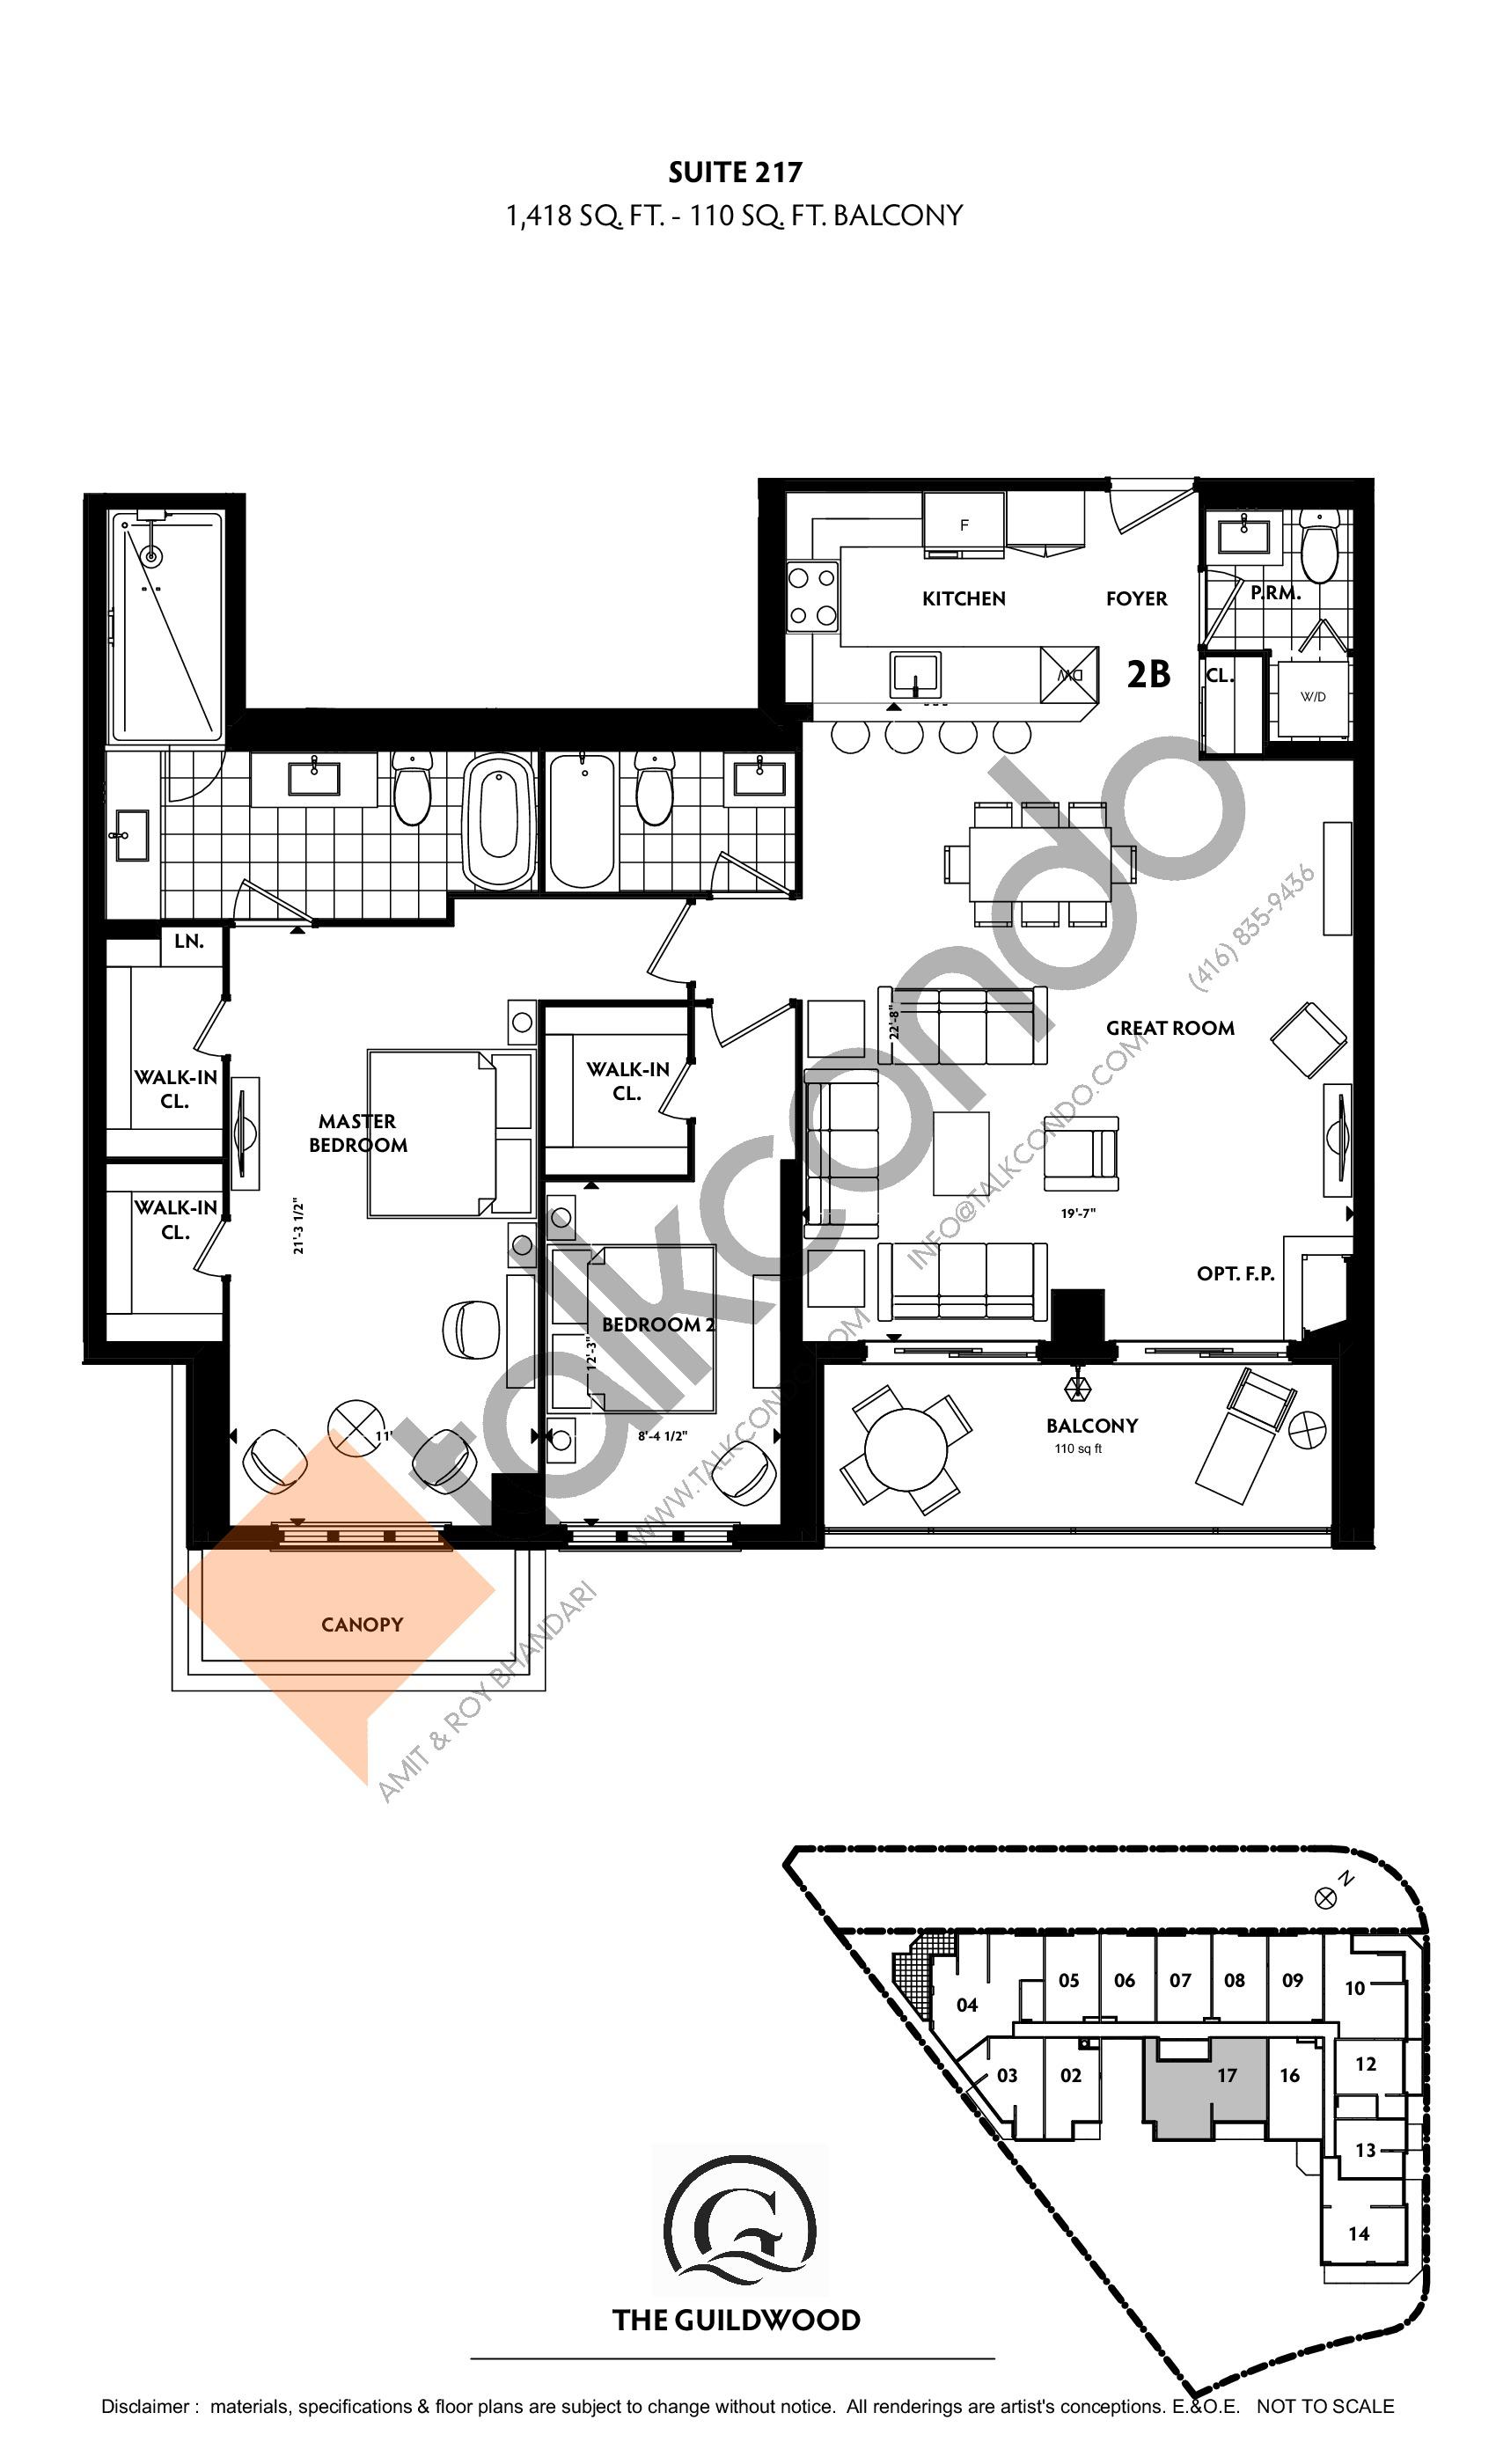 Suite 217 Floor Plan at Guildwood Condos - 1418 sq.ft